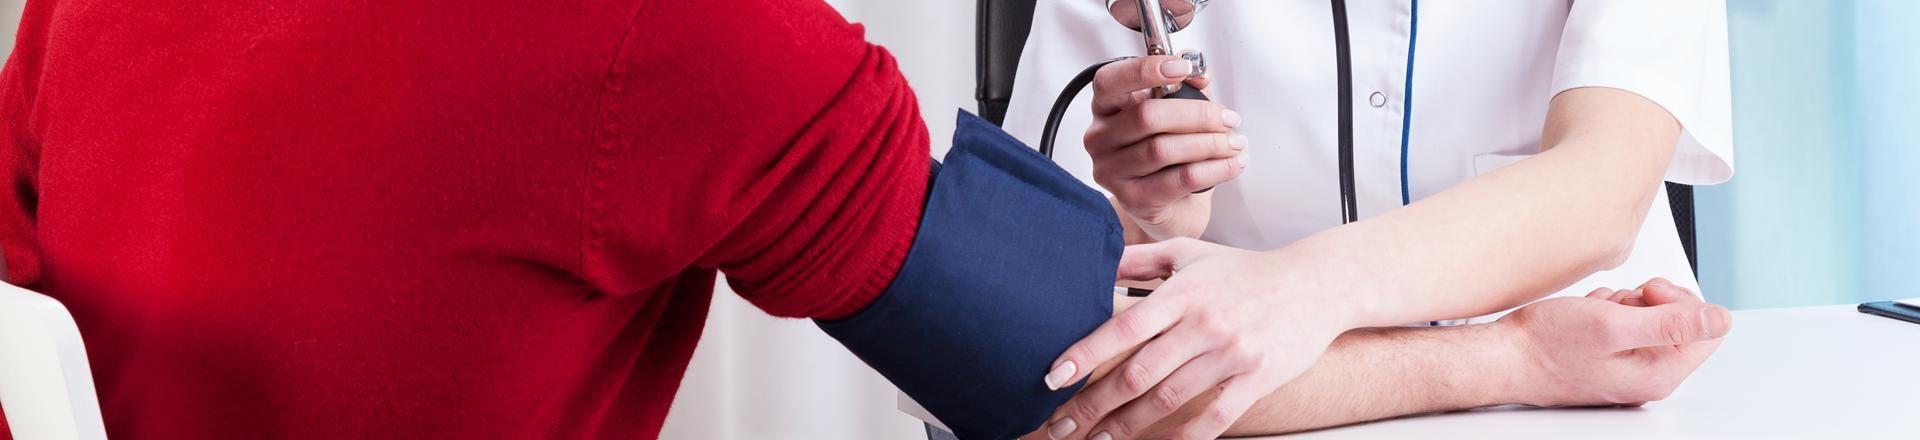 Can Diabetics Take Melatonin